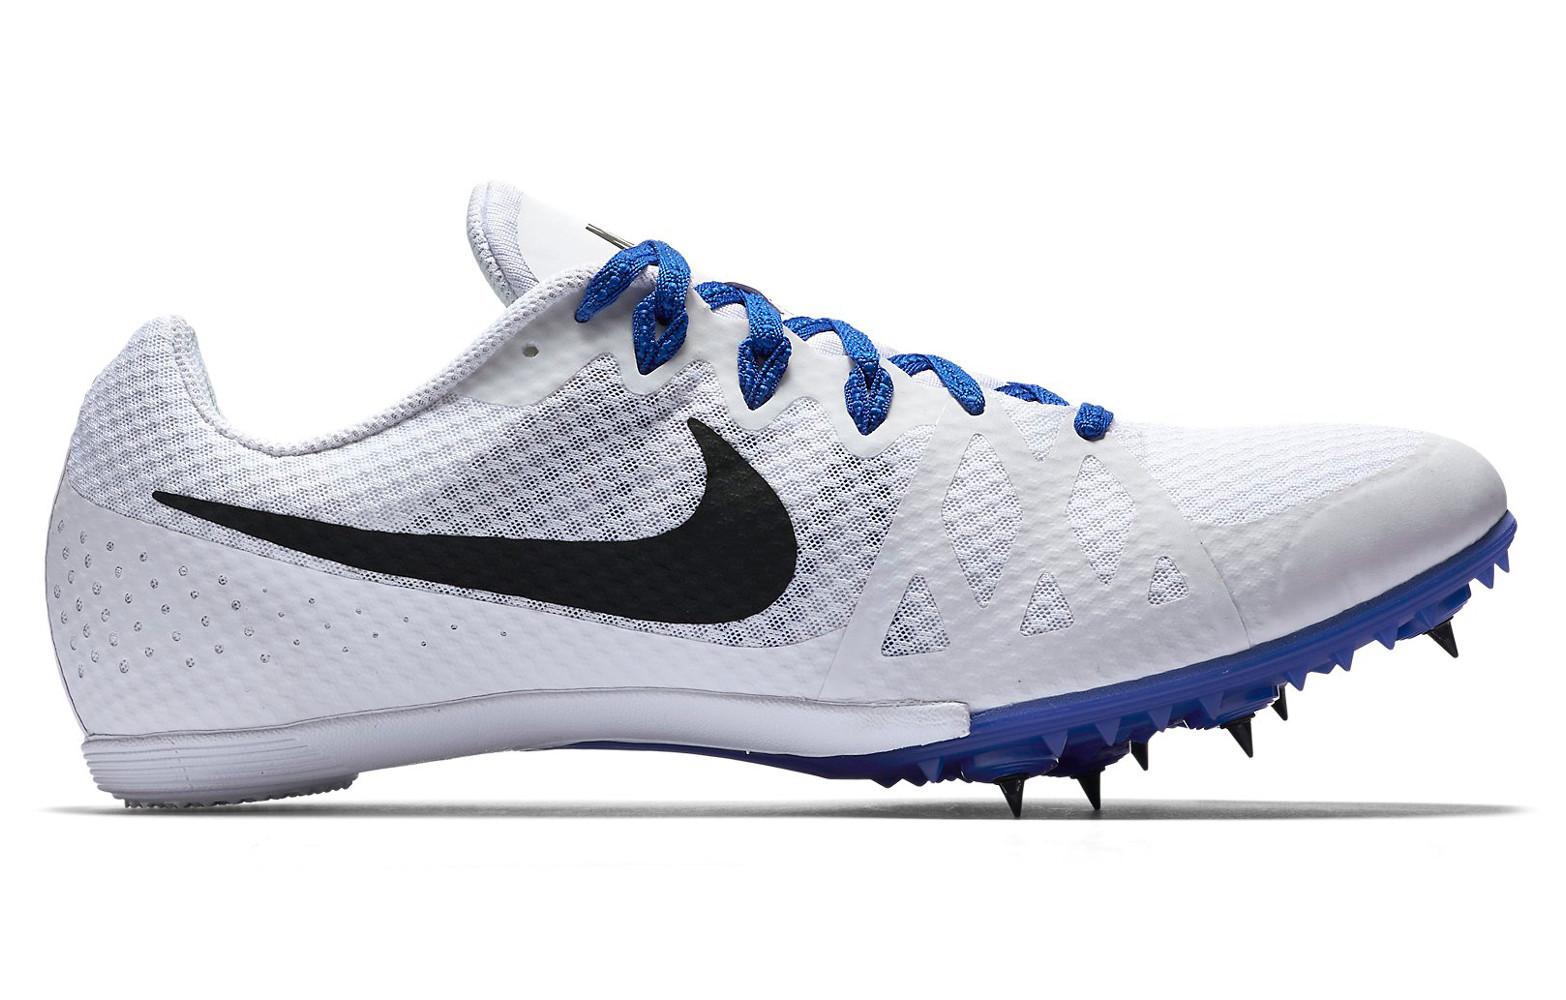 promo code 03fb5 adfc4 Chaussures dAthlétisme Nike ZOOM RIVAL M 8 Blanc